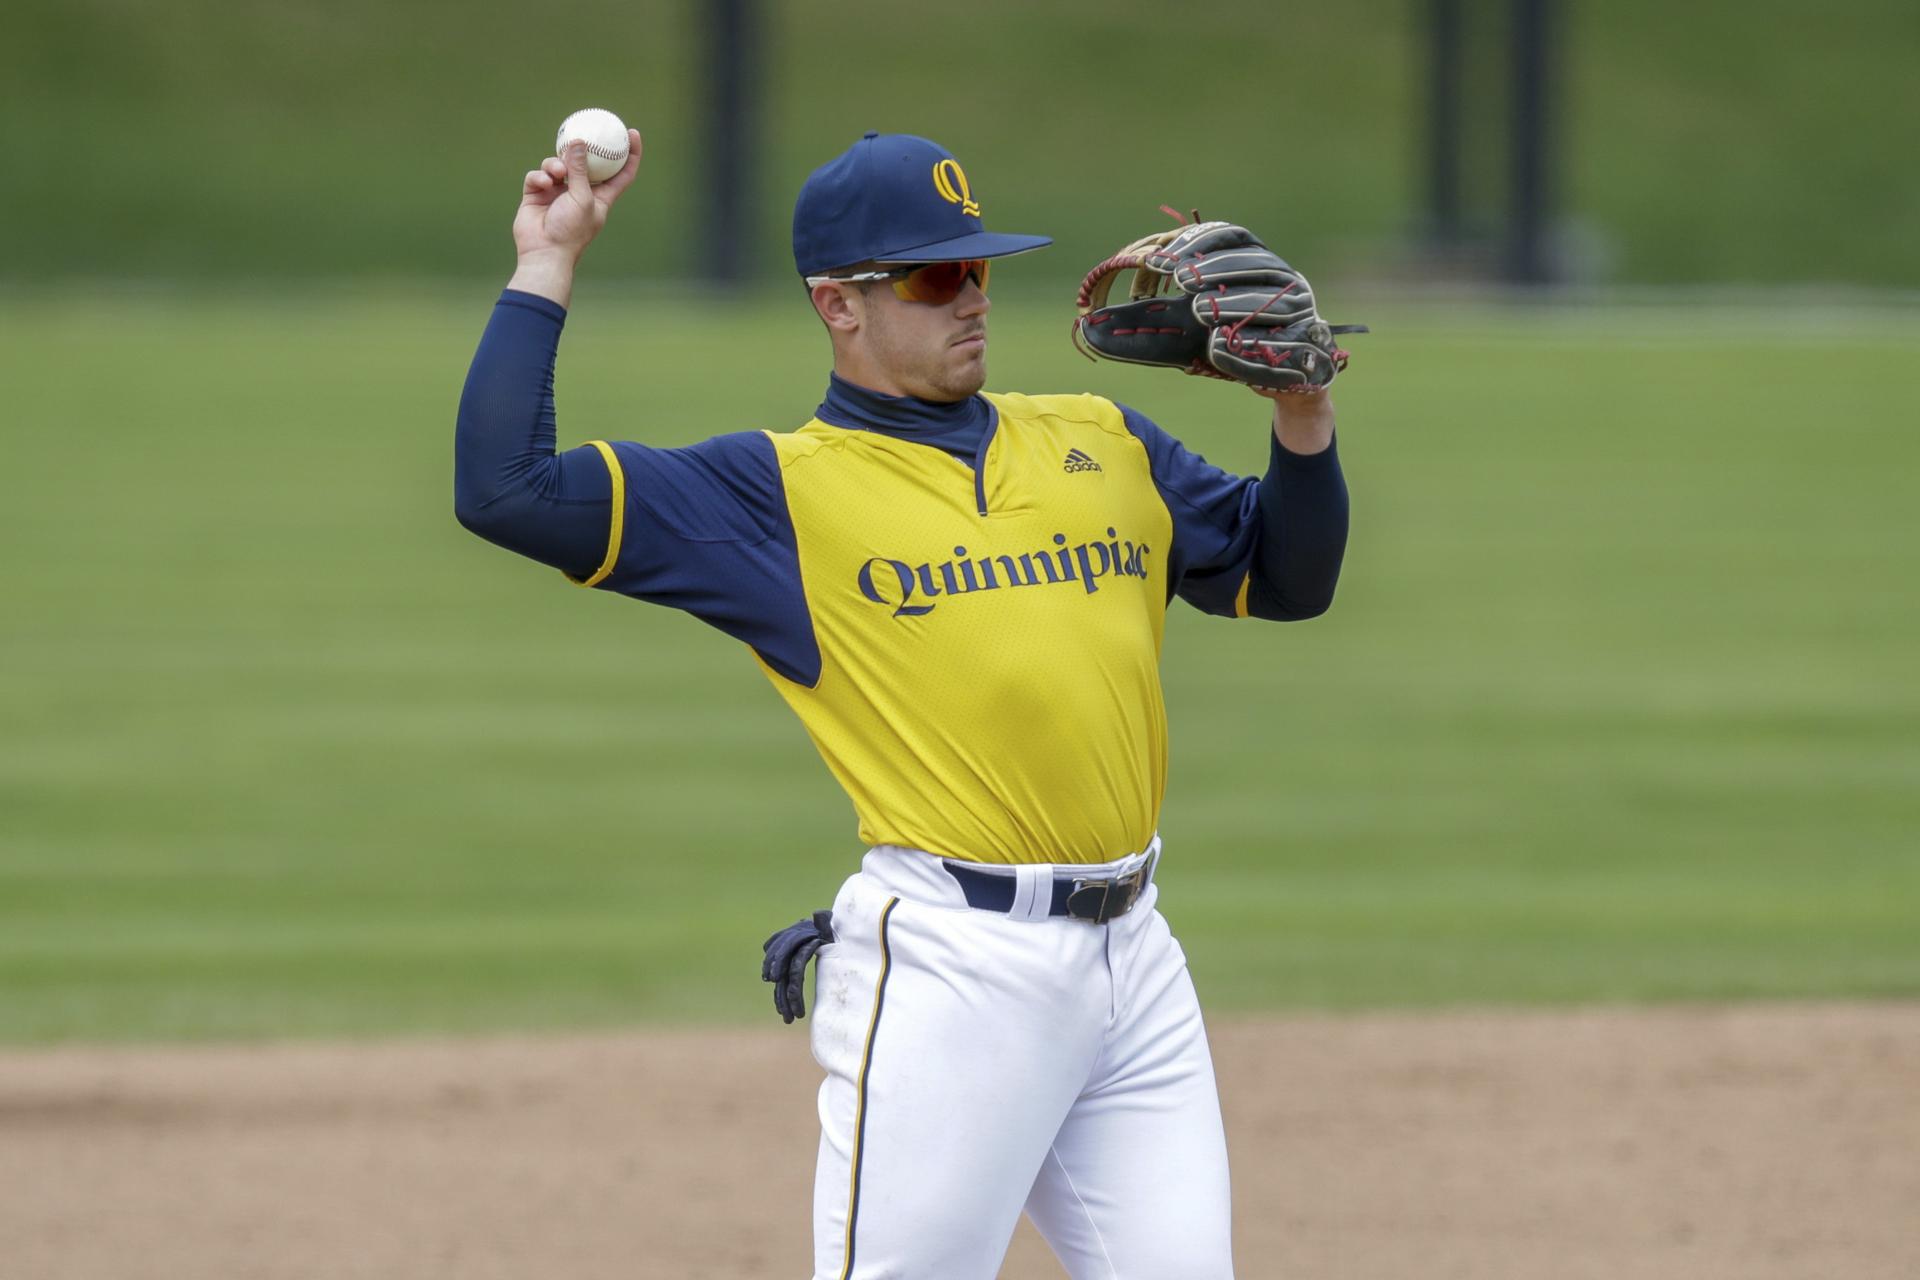 Quinnipiac Baseball Evan Vulgamore